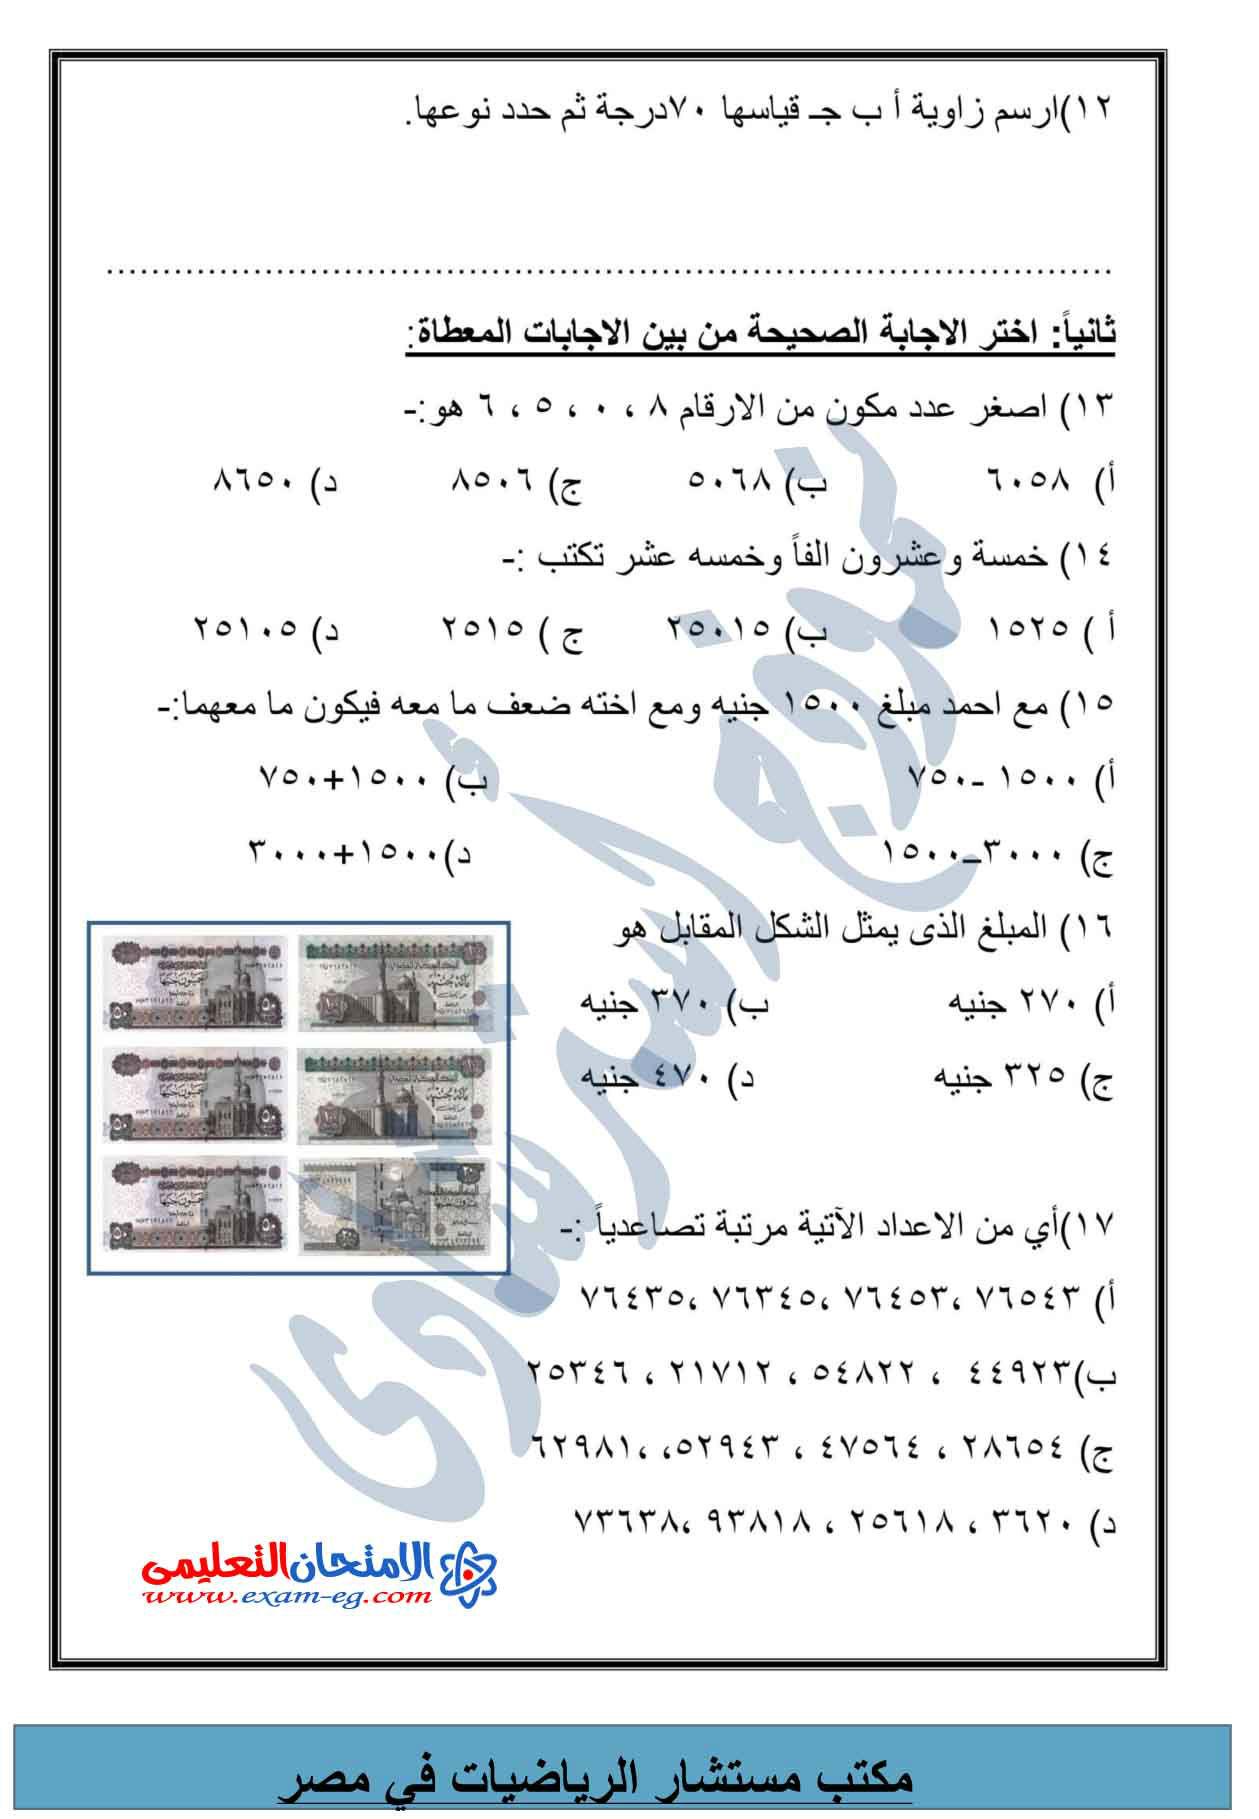 exam-eg.com_1449242034463.jpg